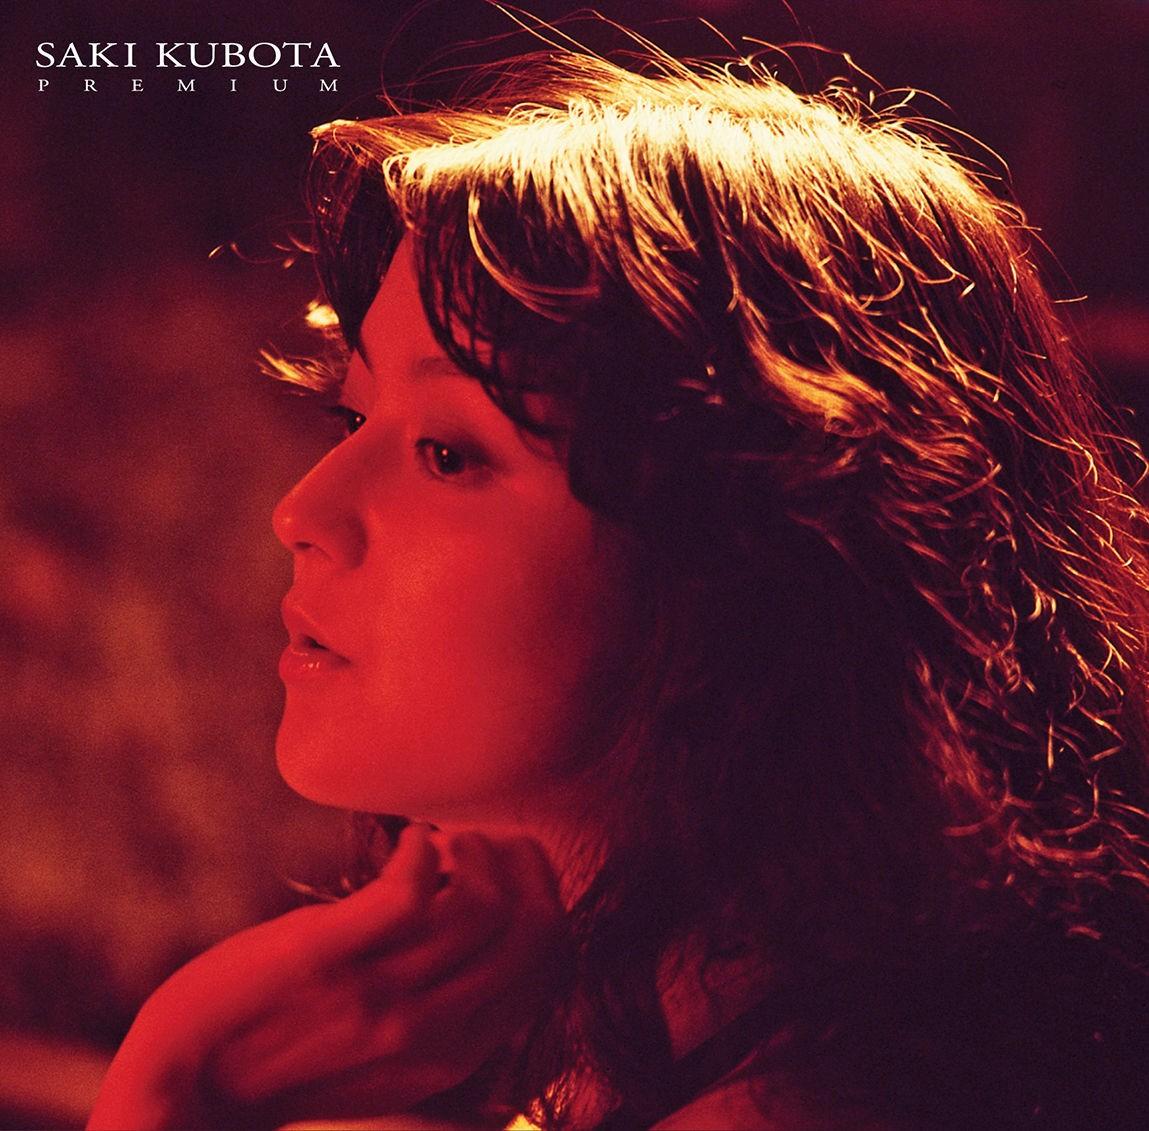 Download Saki Kubota Saki Kubota PREMIUM album